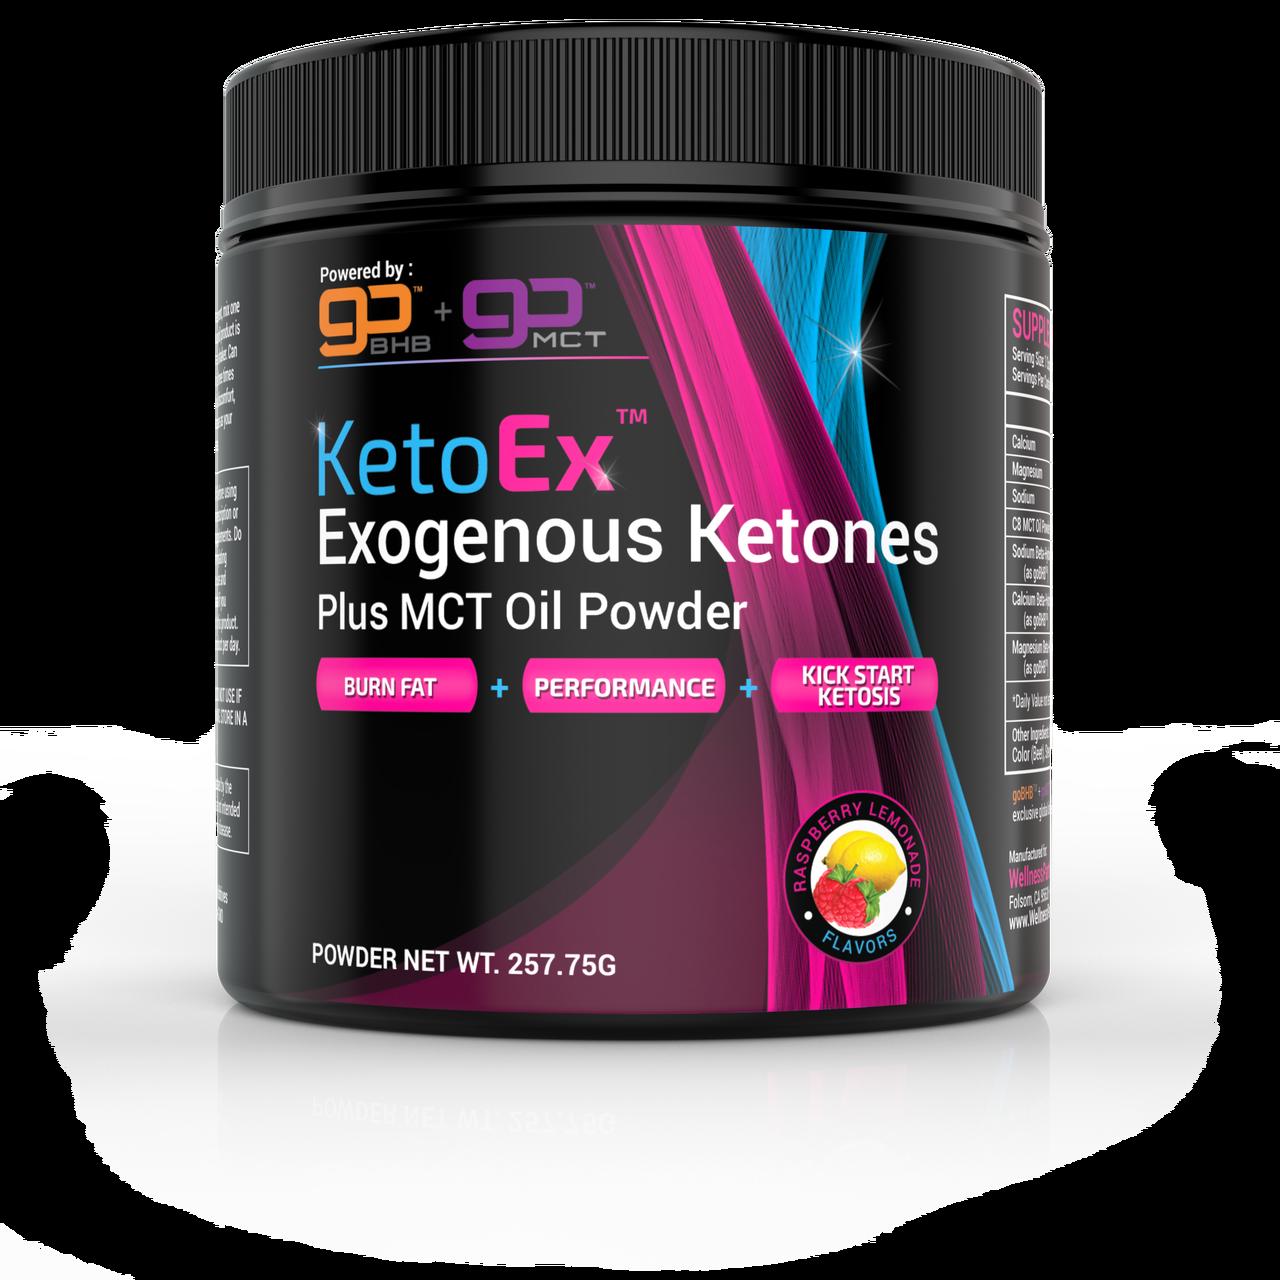 KetoEX